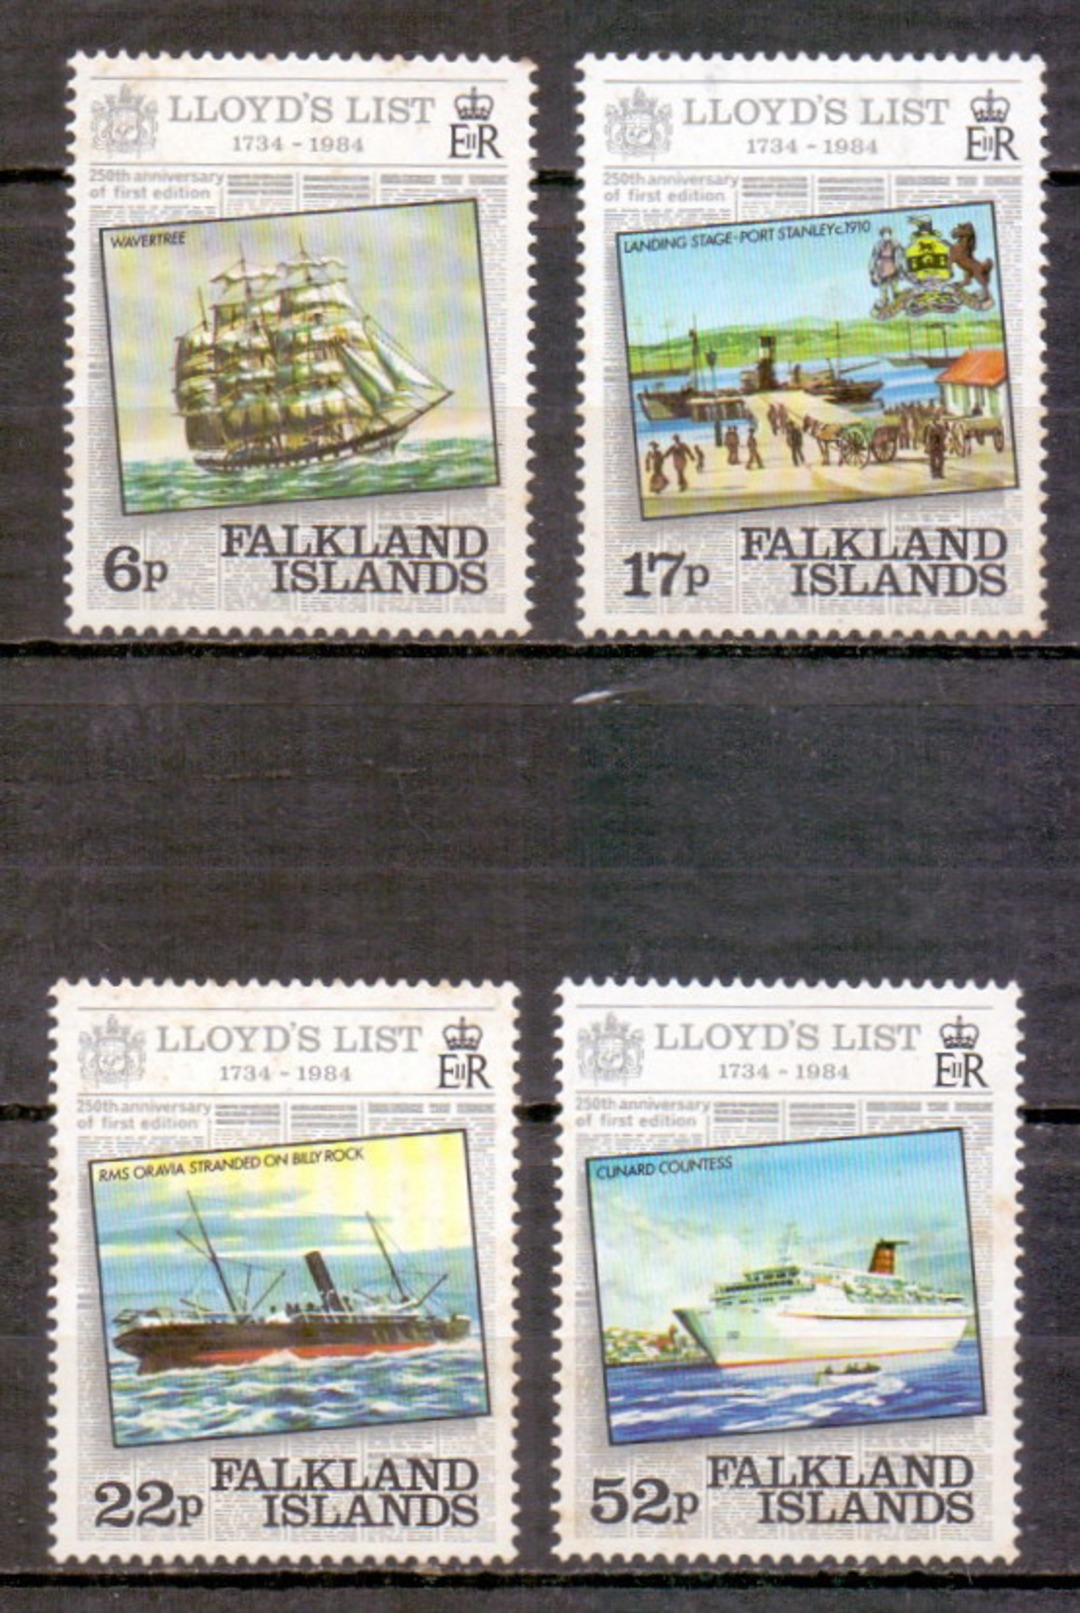 Falkland Islands 1984 250th Anniversary Of Lloyd's List Newspaper, Ship, Joint Issue (4v) MNH (M-336) - Falkland Islands